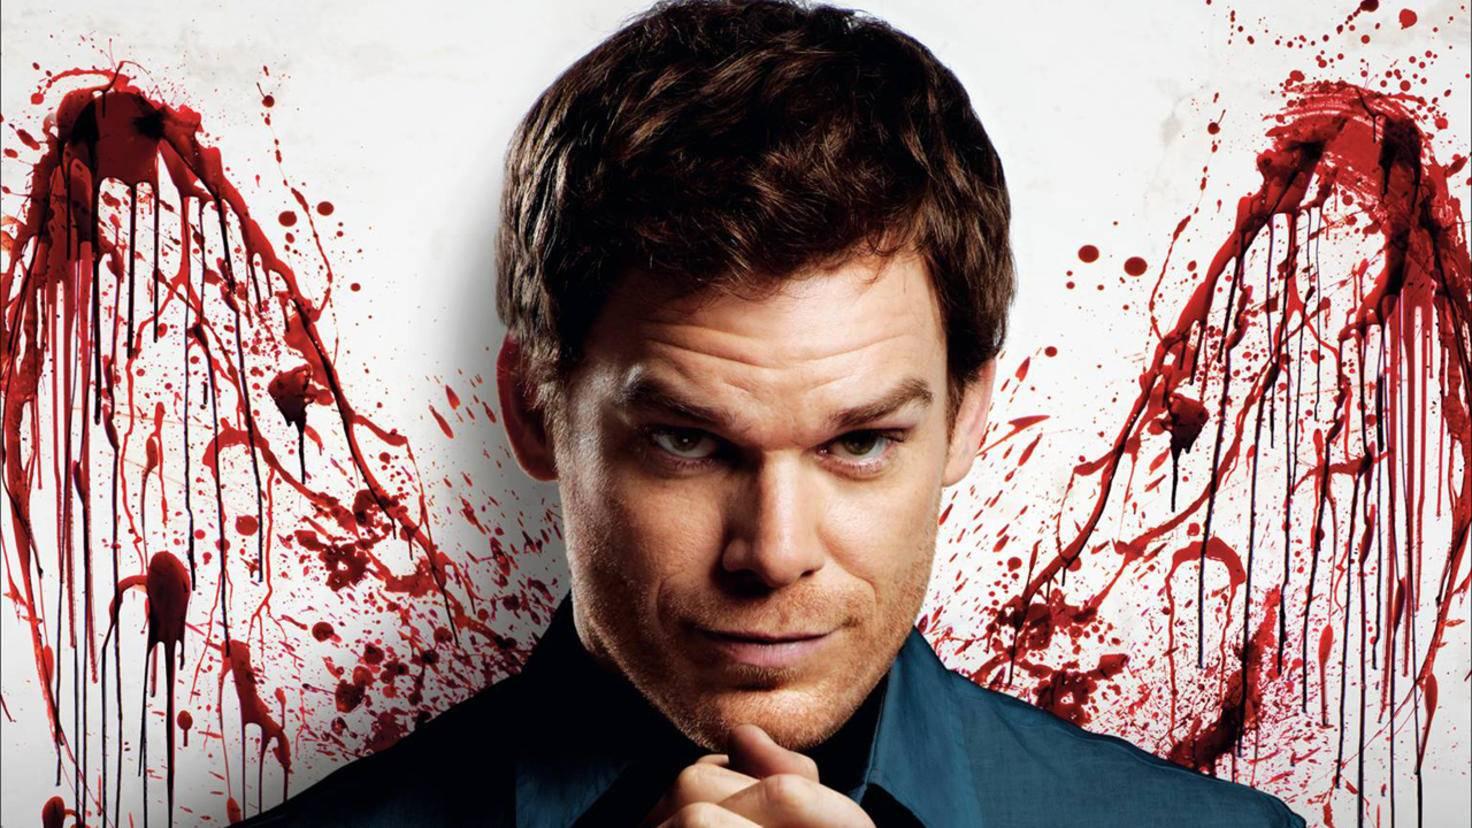 Meister im Unter-die-Erde-Bringen: Michael C. Hall als Dexter